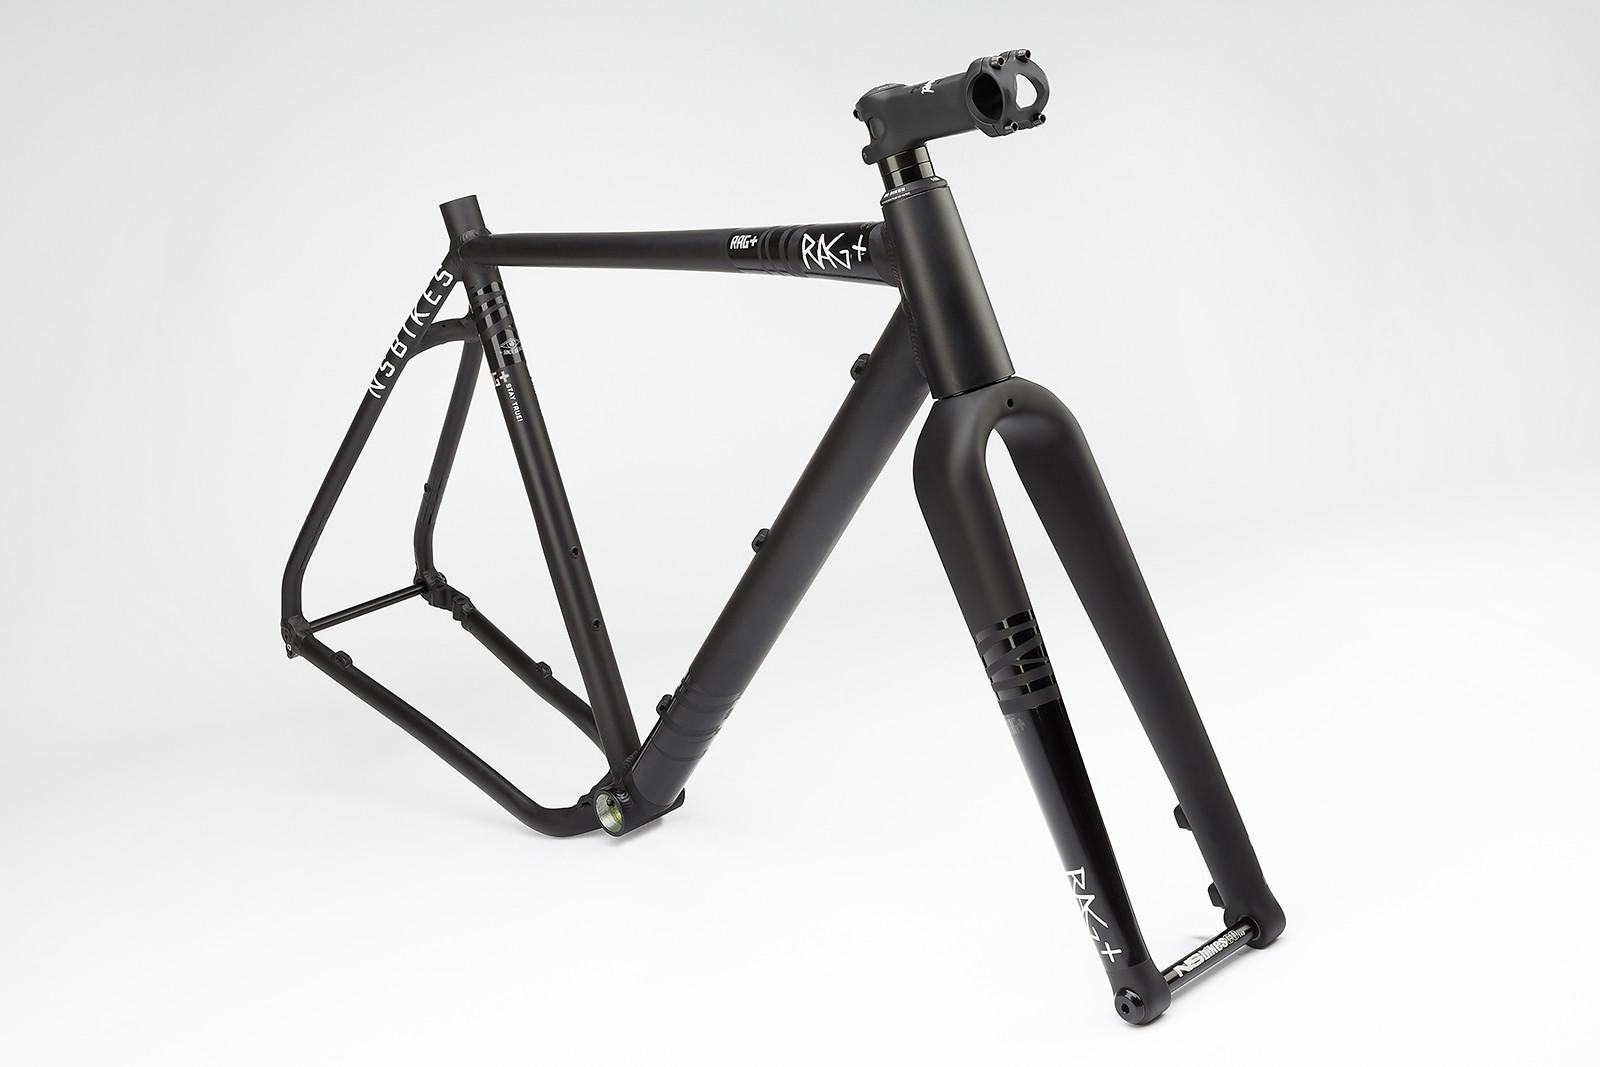 NS Bikes Rag + Rahmen Gabel Set, Modell 2018   Bikemarkt.MTB-News.de